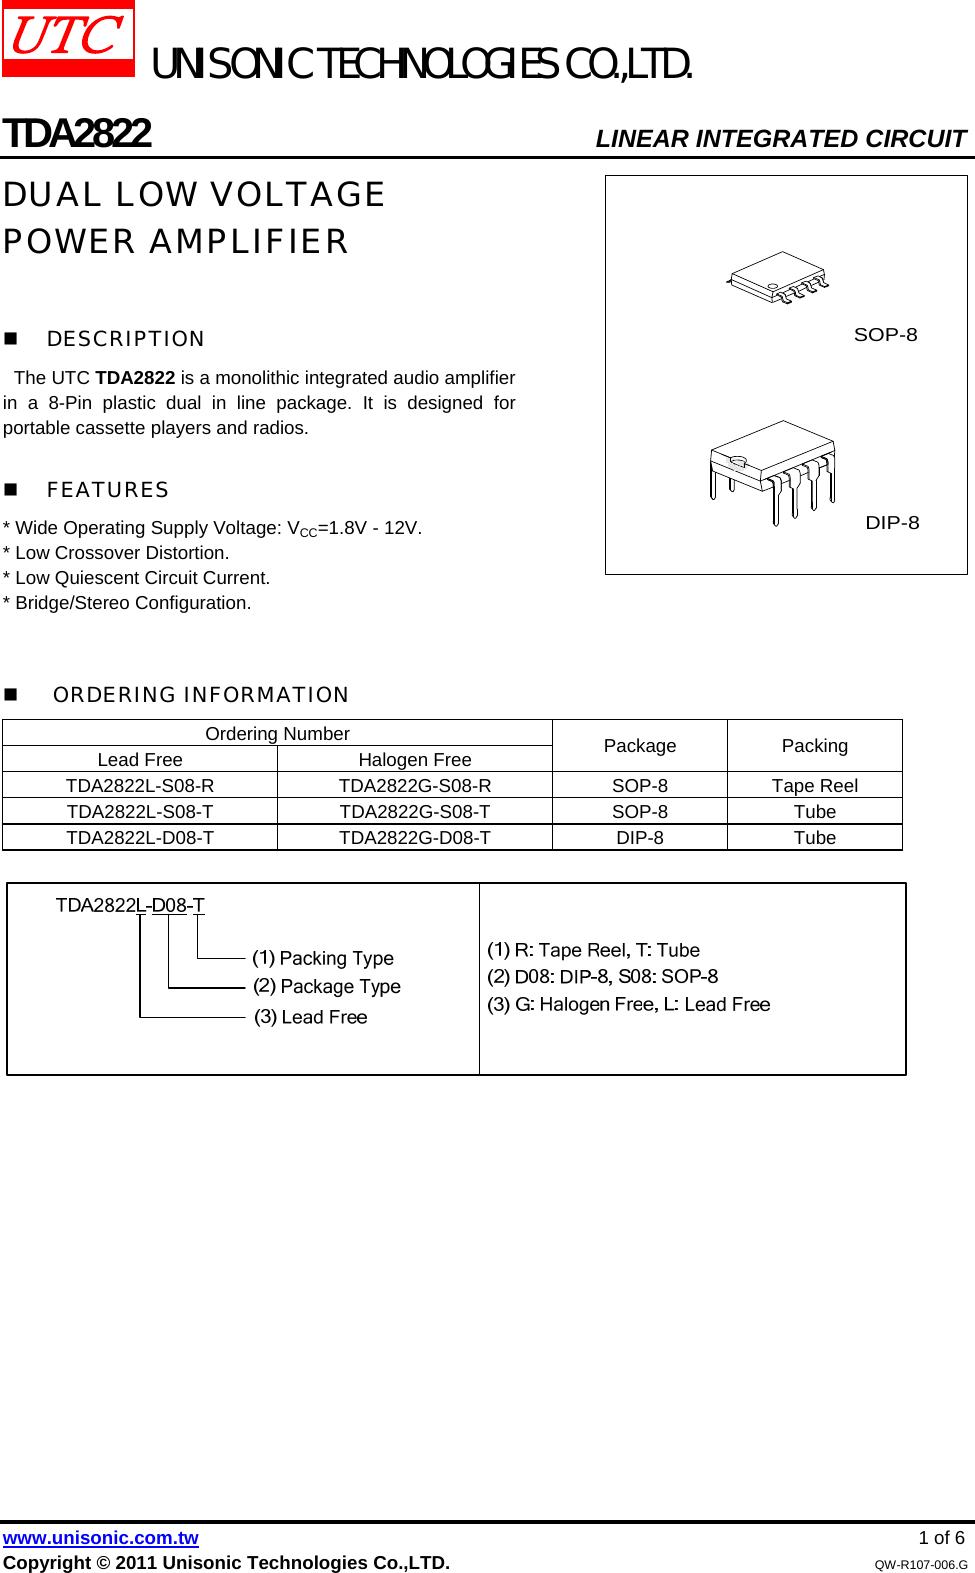 Tda2822 Datasheet S Manualscom Utc Stereo Audio Power Amplifier Circuit